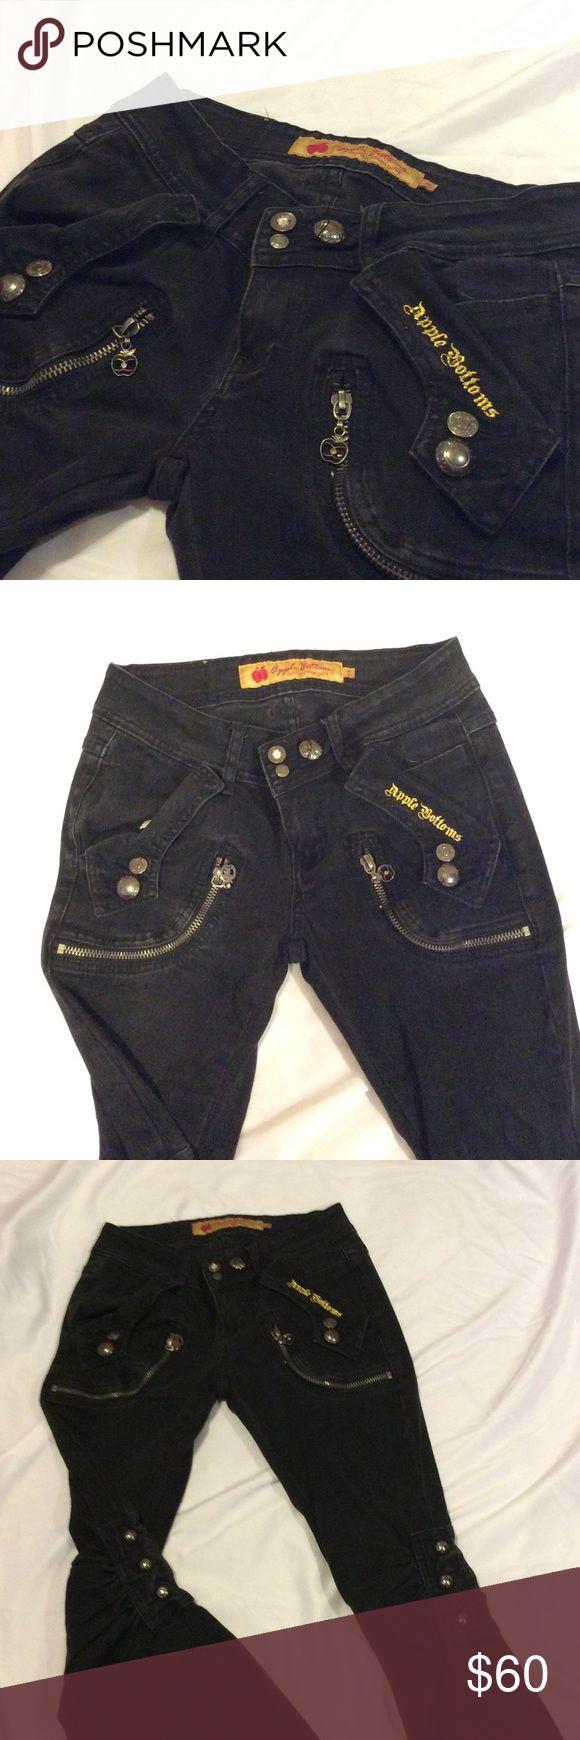 Apple bottom jeans size 6